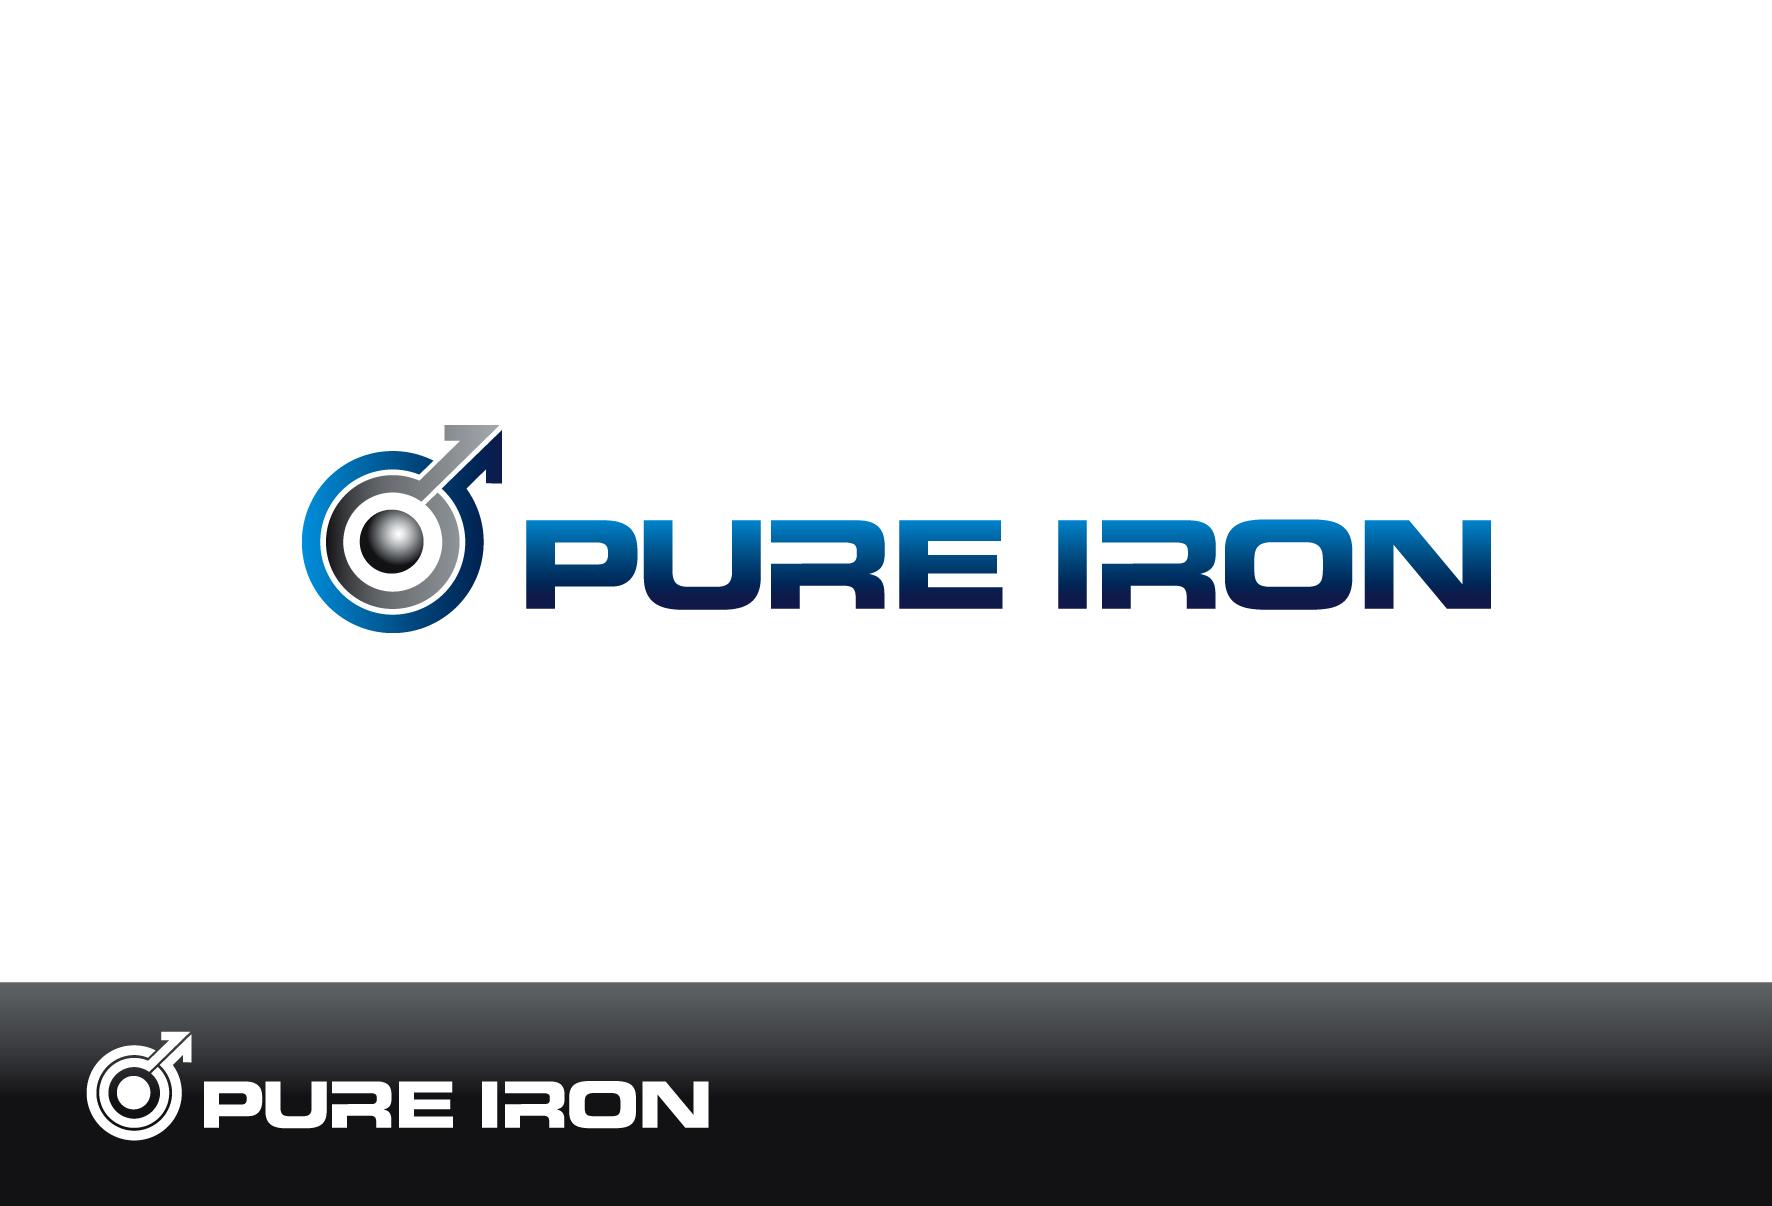 Logo Design by luna - Entry No. 20 in the Logo Design Contest Fun Logo Design for Pure Iron.